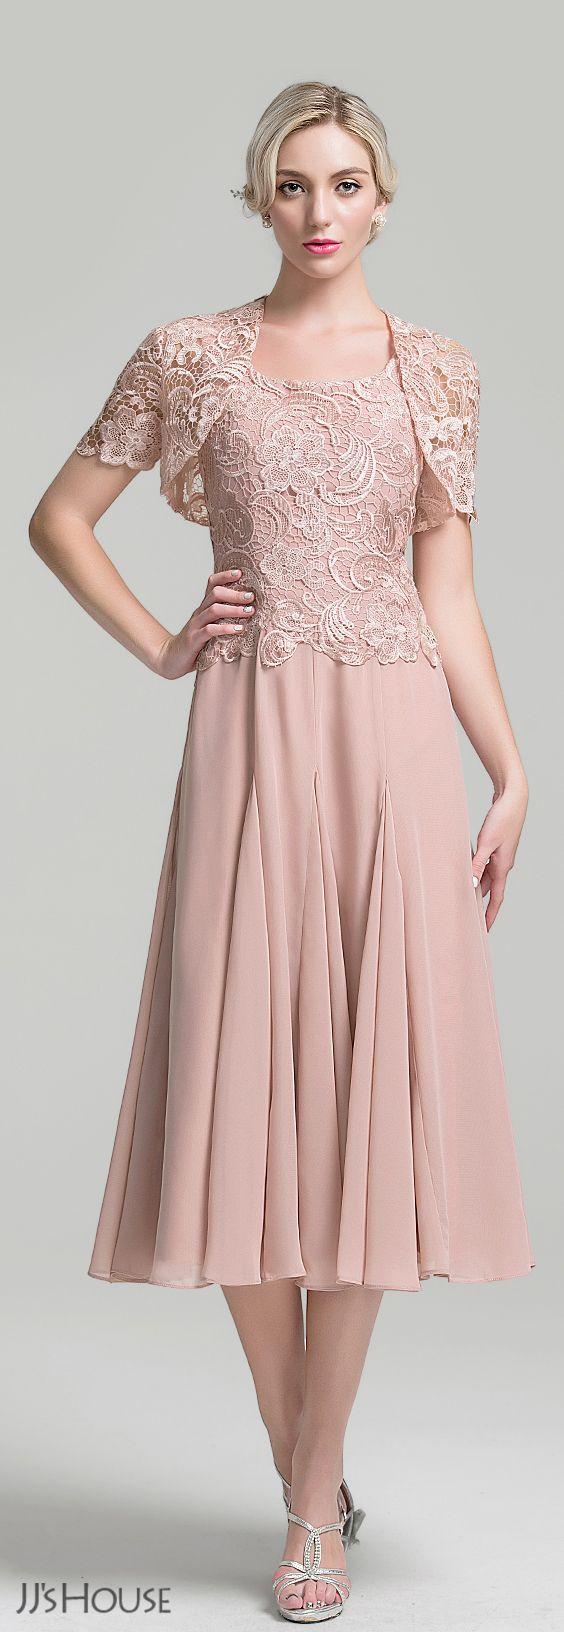 73 best Wedding images on Pinterest | Wedding ideas, Bridal gowns ...